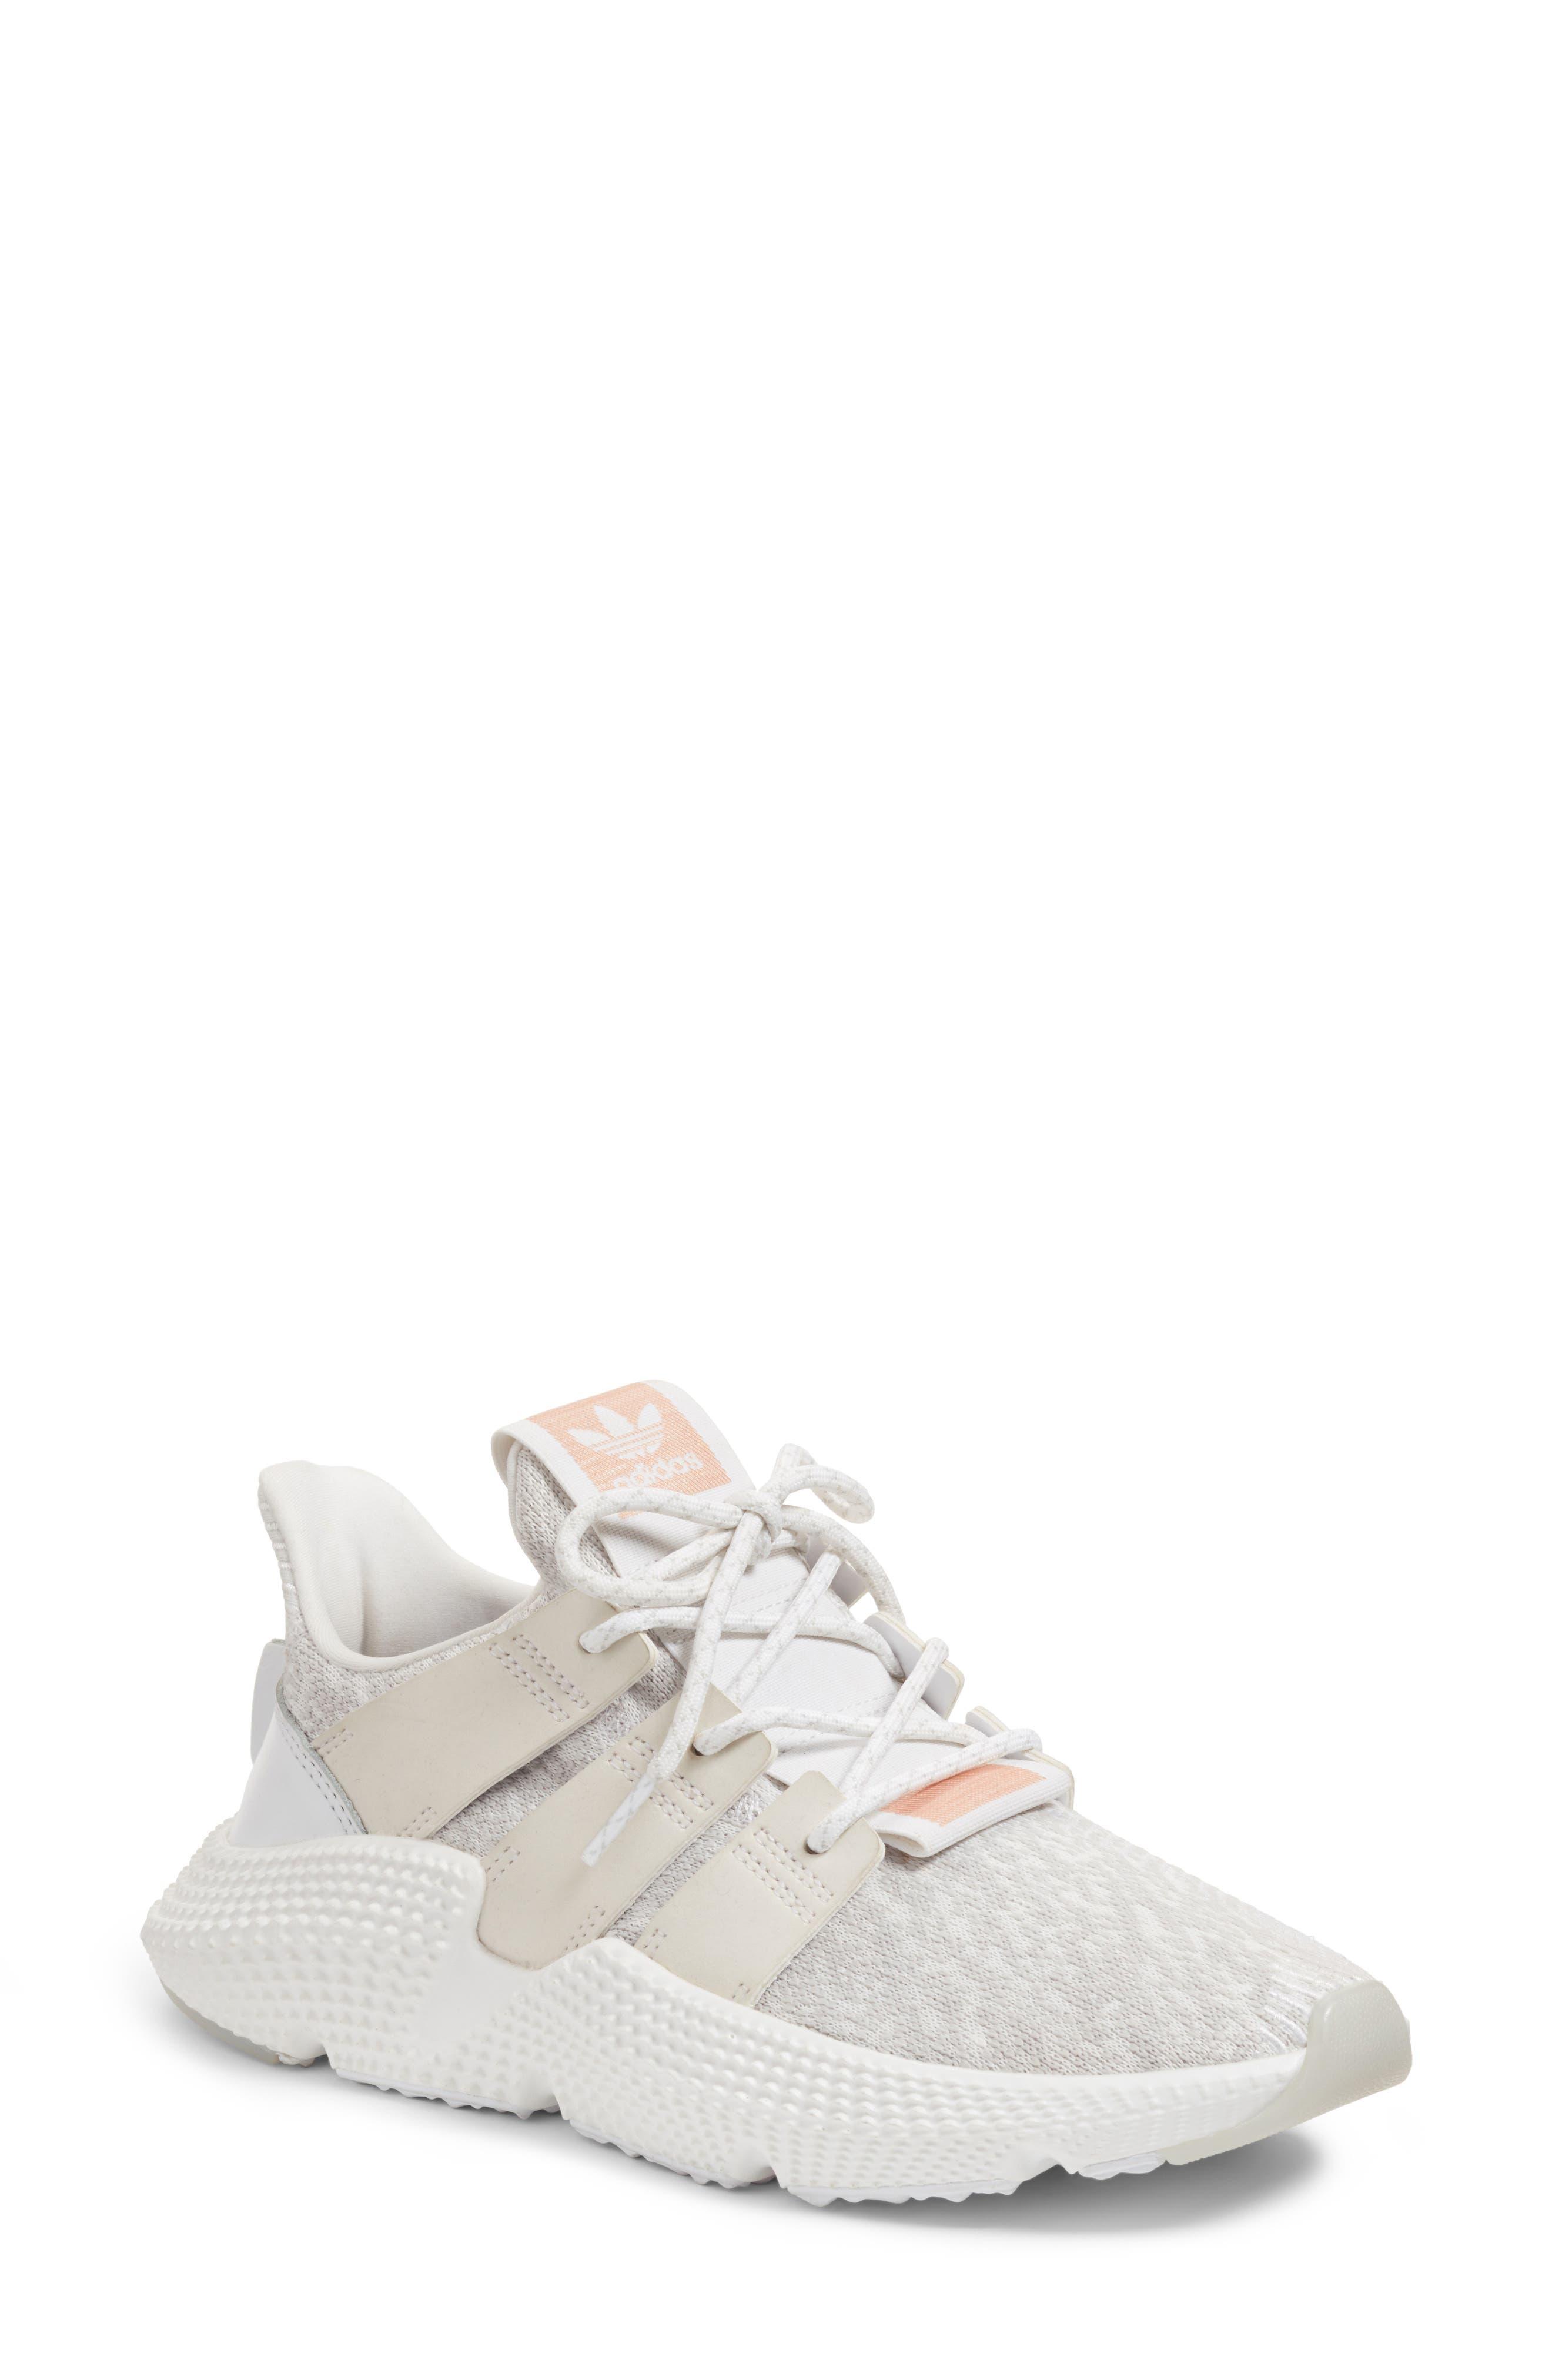 Prophere Sneaker,                         Main,                         color, White/ White/ Supplier Colour